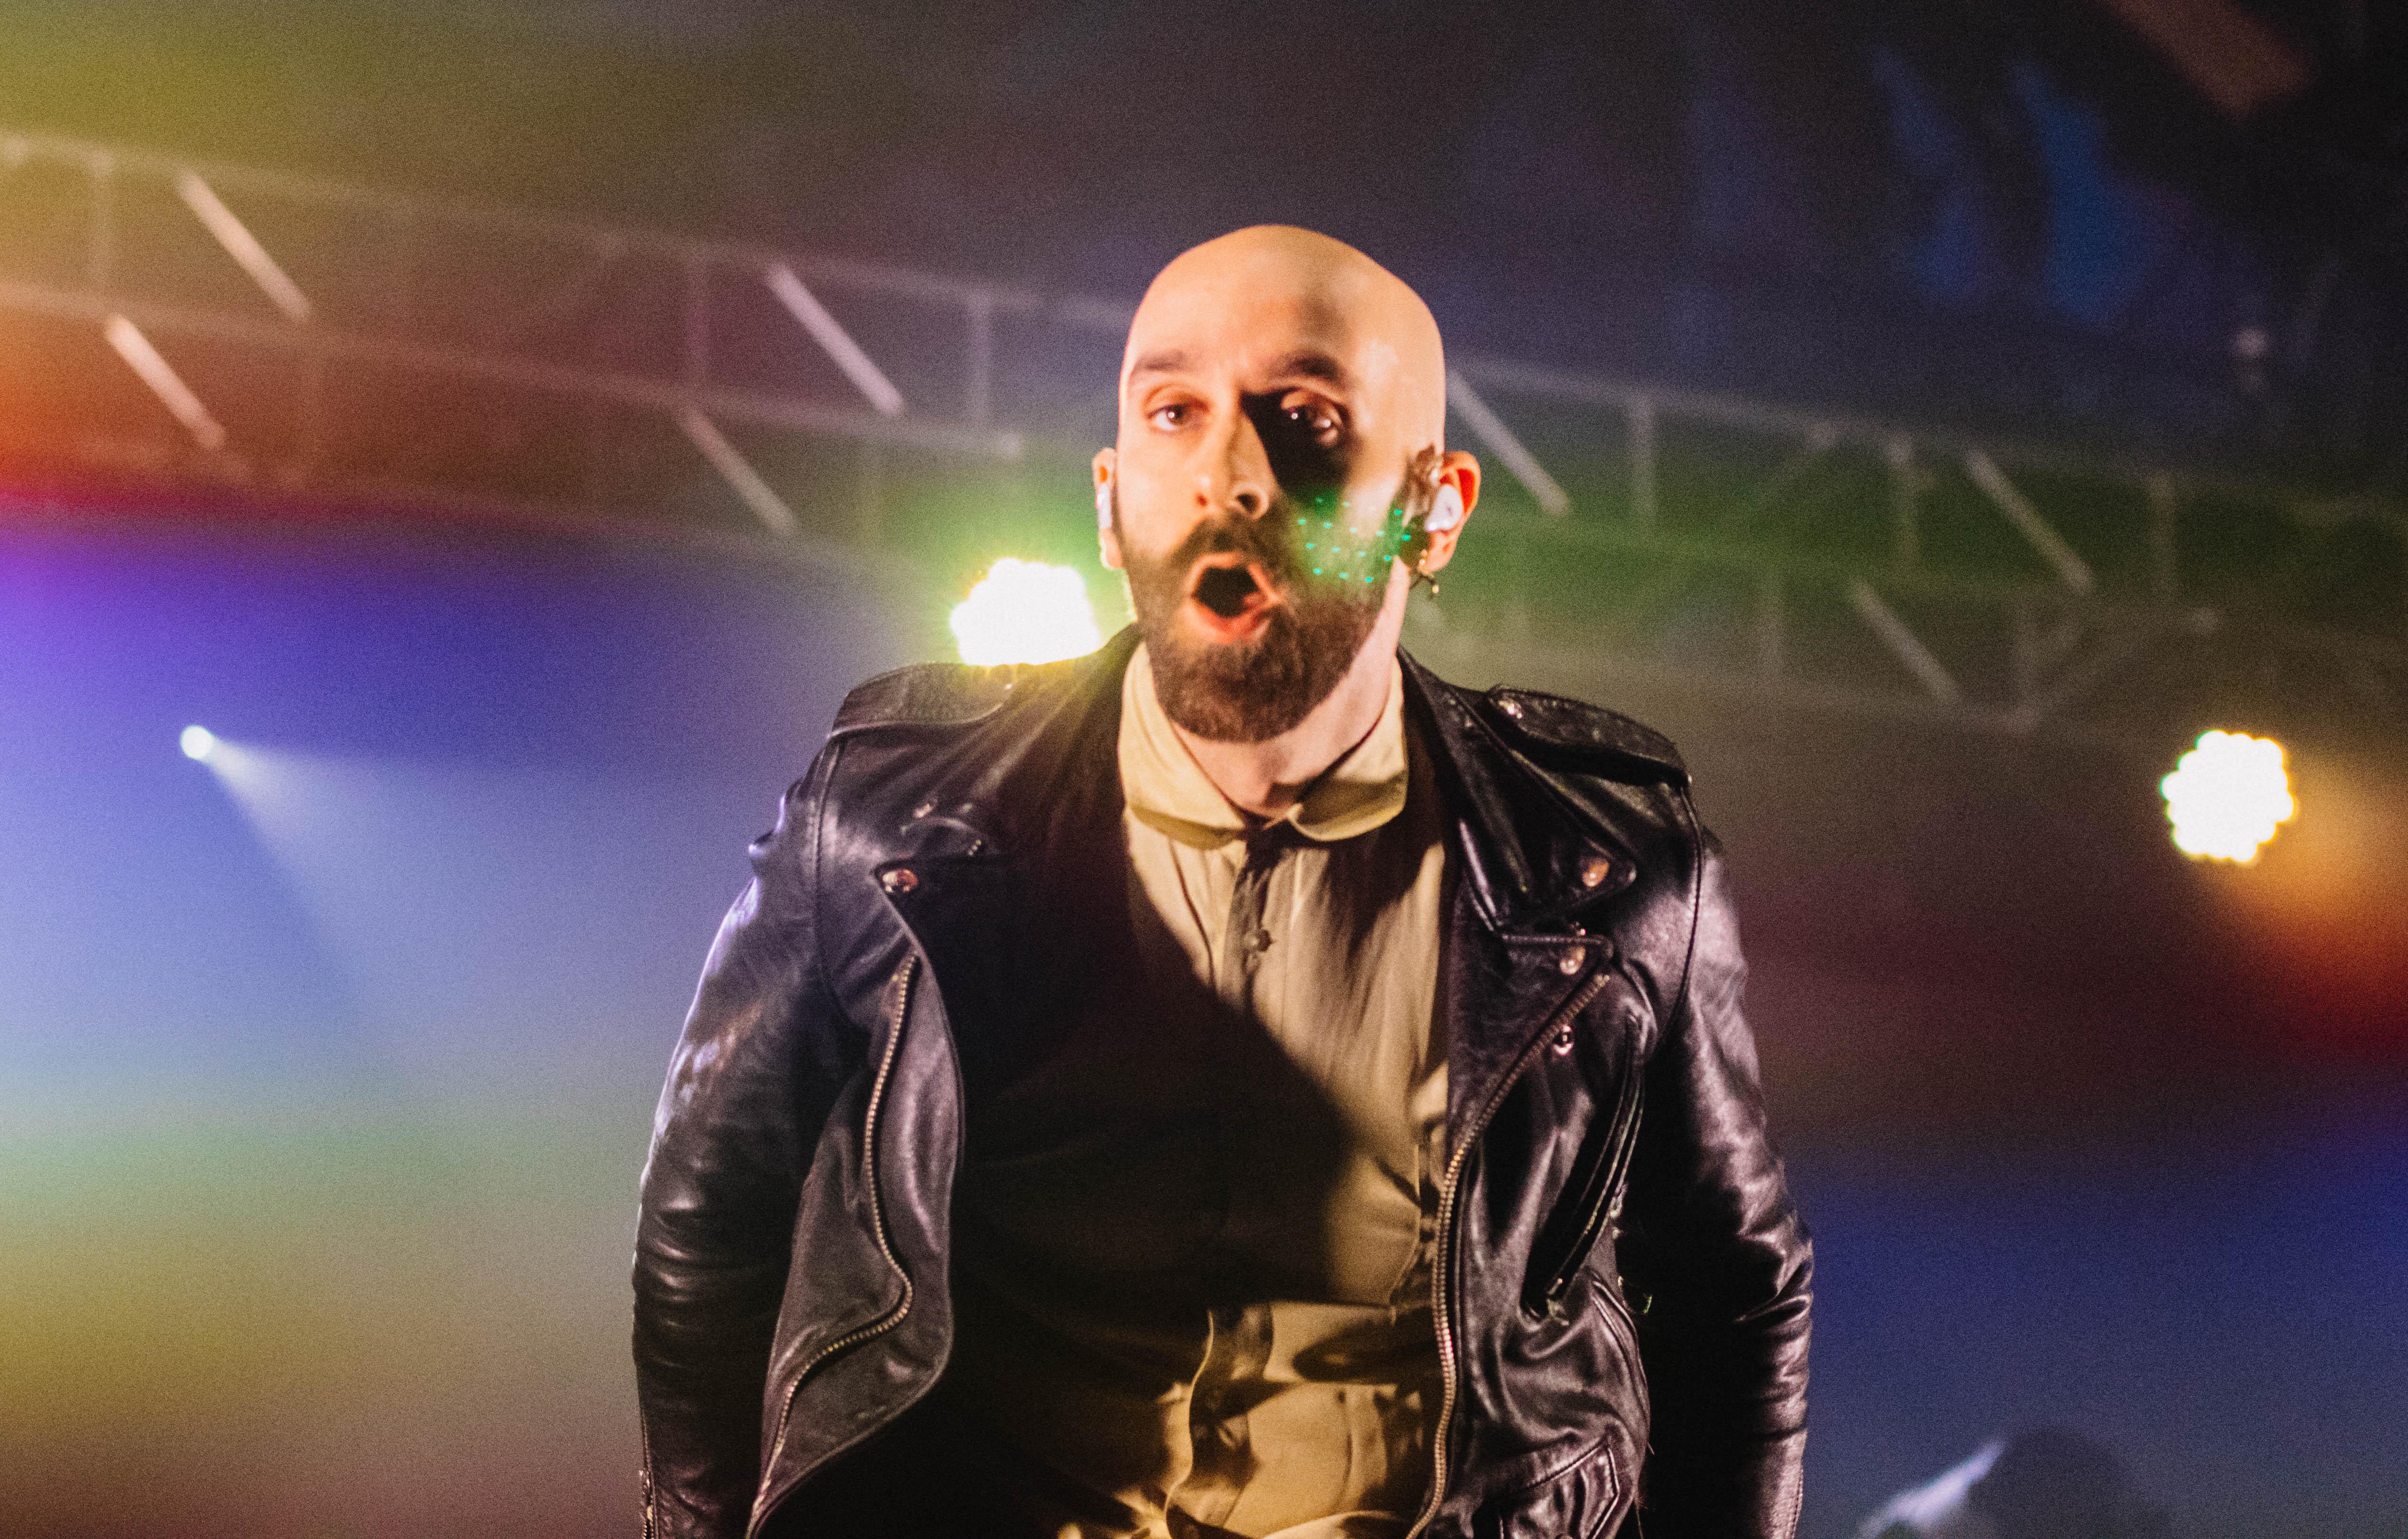 LIVE REVIEW: X Ambassadors ignite the Aragon Ballroom